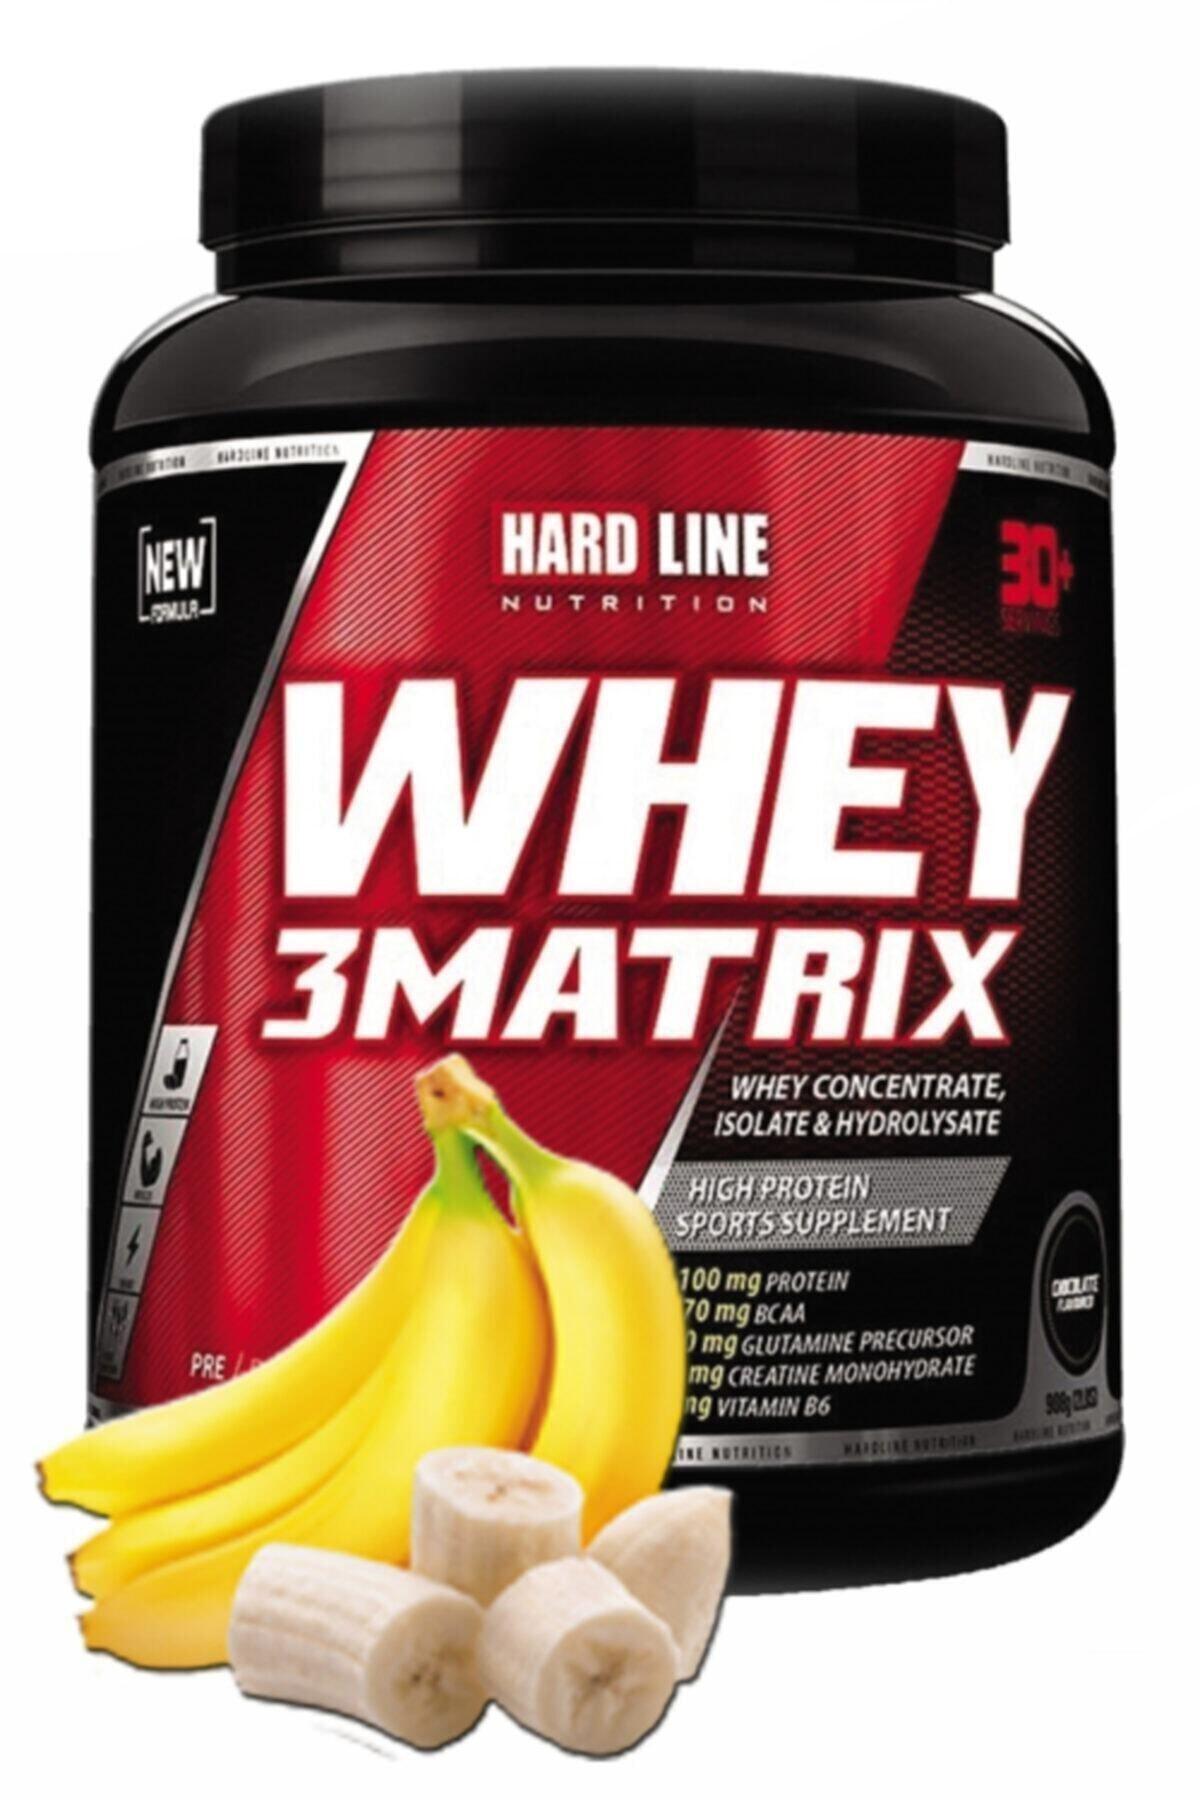 Hardline Whey 3matrix Muzlu Protein Tozu 908 gr 1